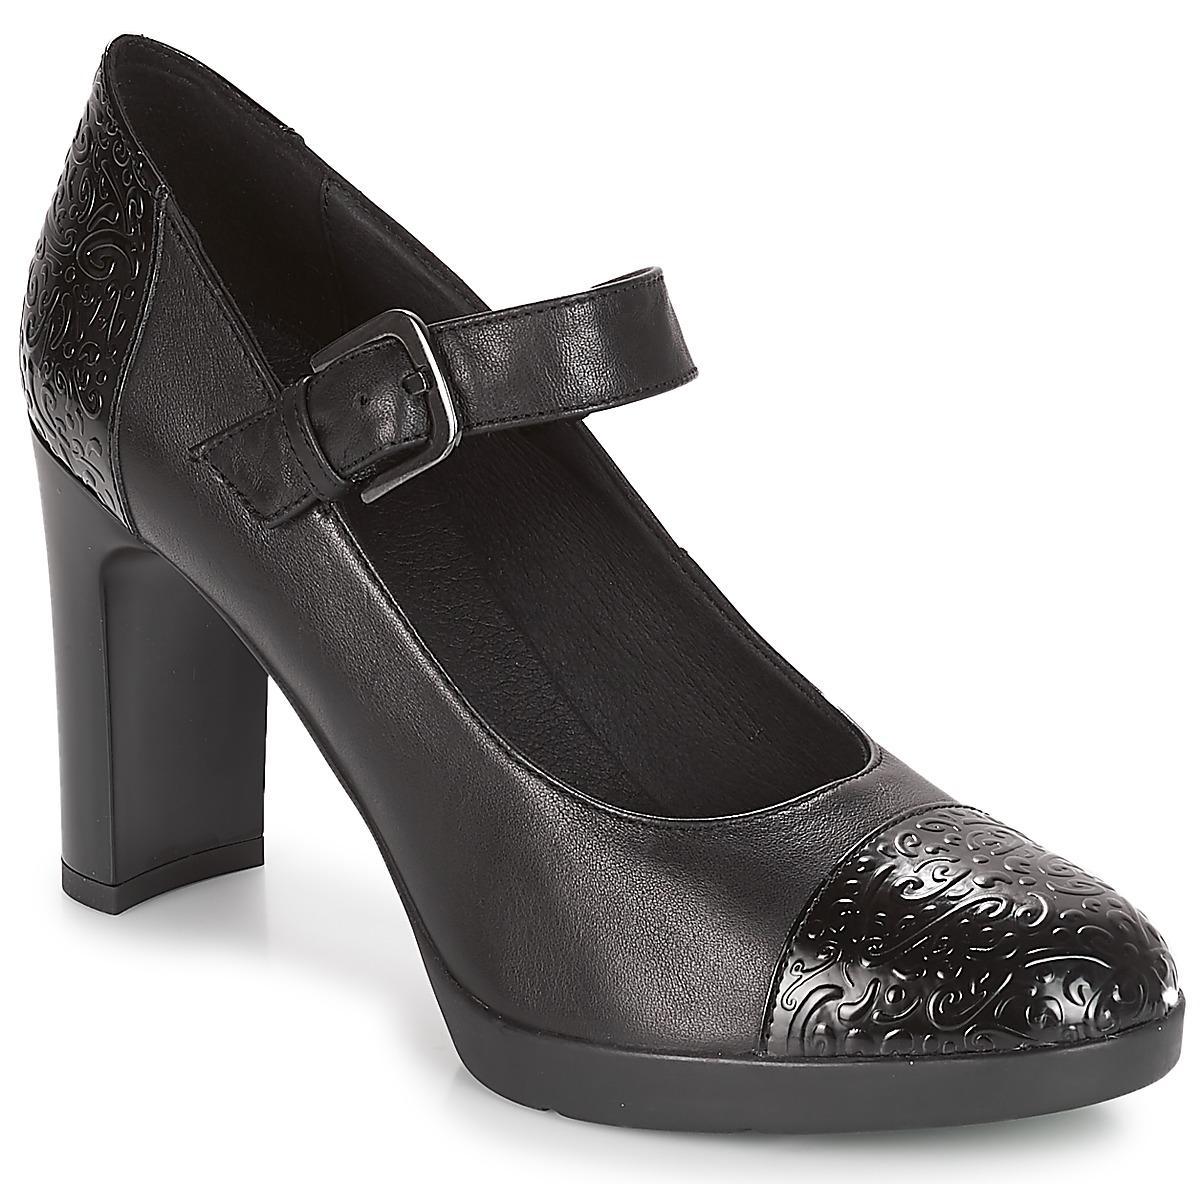 009d01222c7 Geox - D Annya High Women s Court Shoes In Black - Lyst. View fullscreen